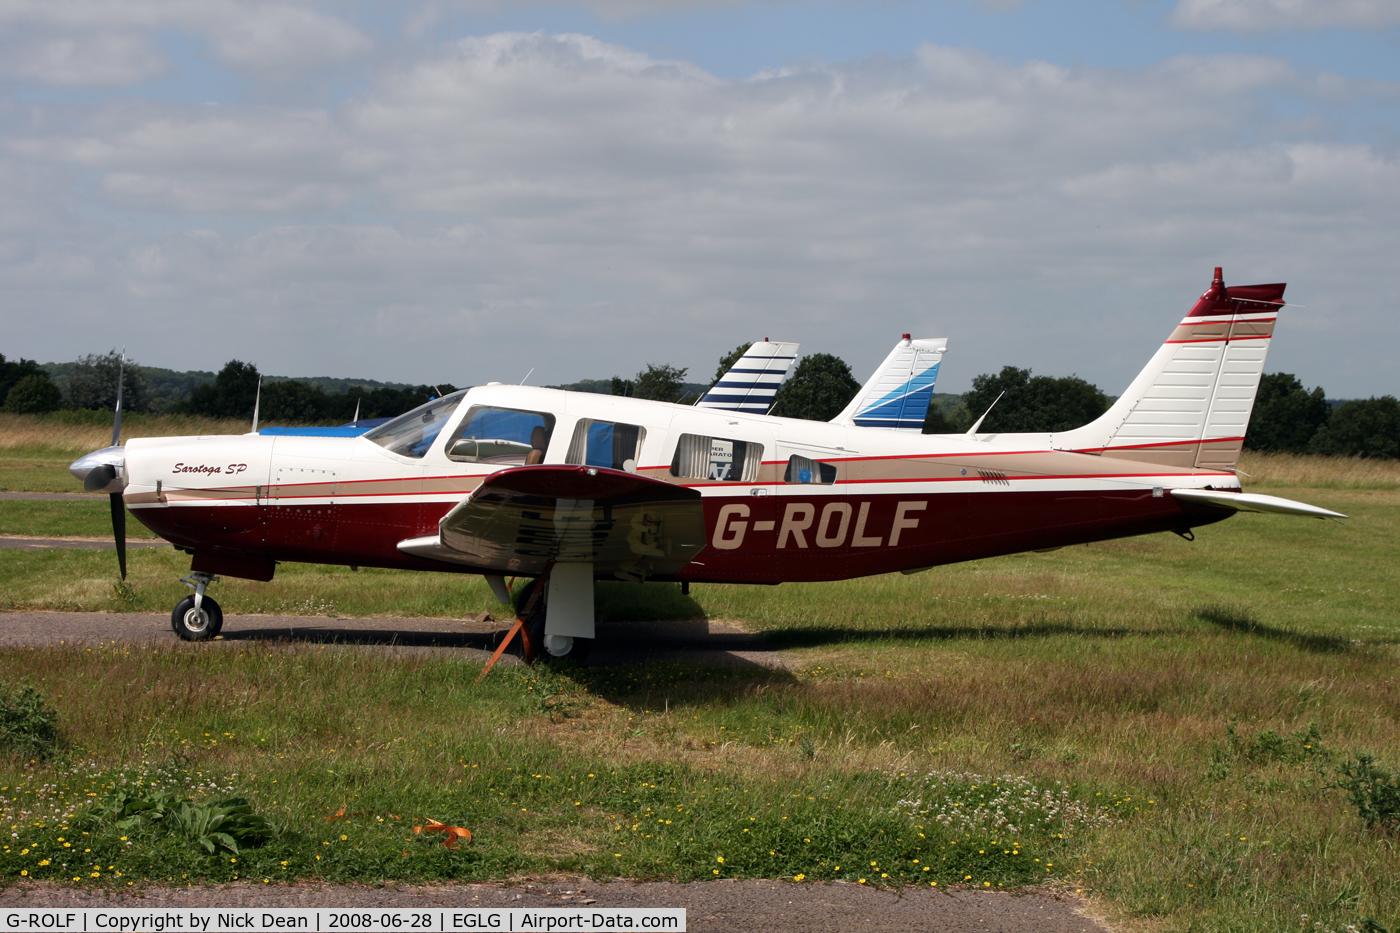 G-ROLF, 1980 Piper PA-32R-301 Saratoga SP C/N 32R-8113018, /